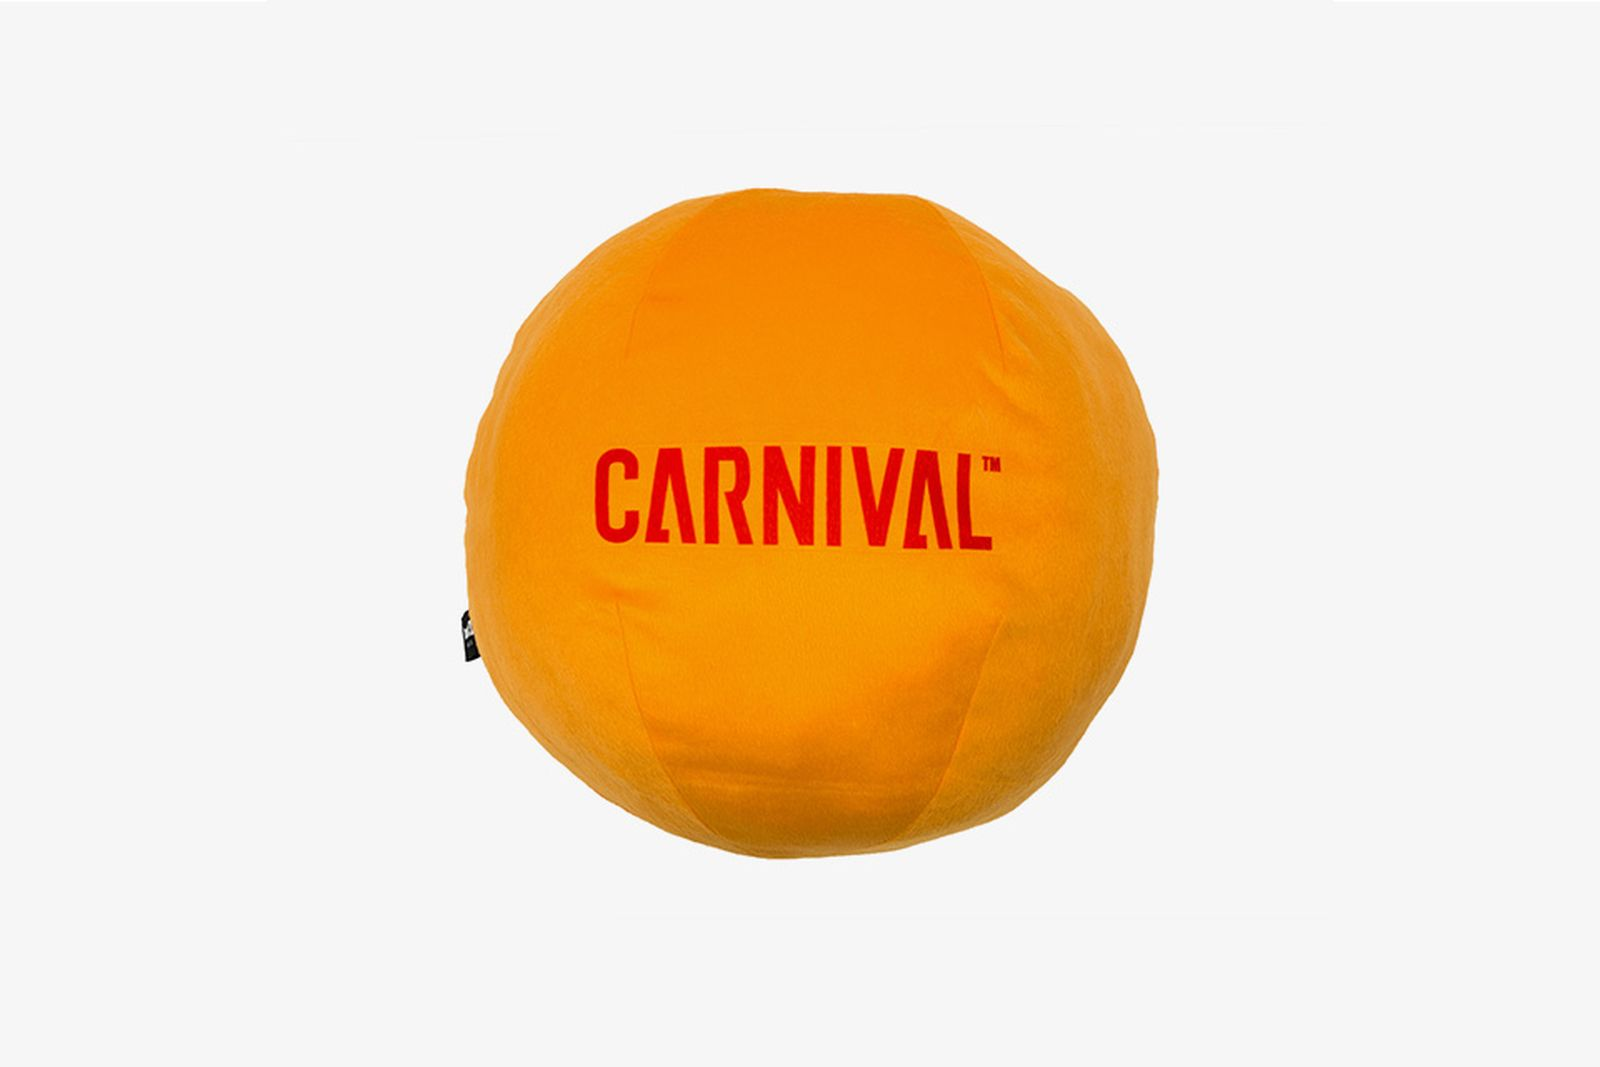 carnival-dragon-ball-z-08